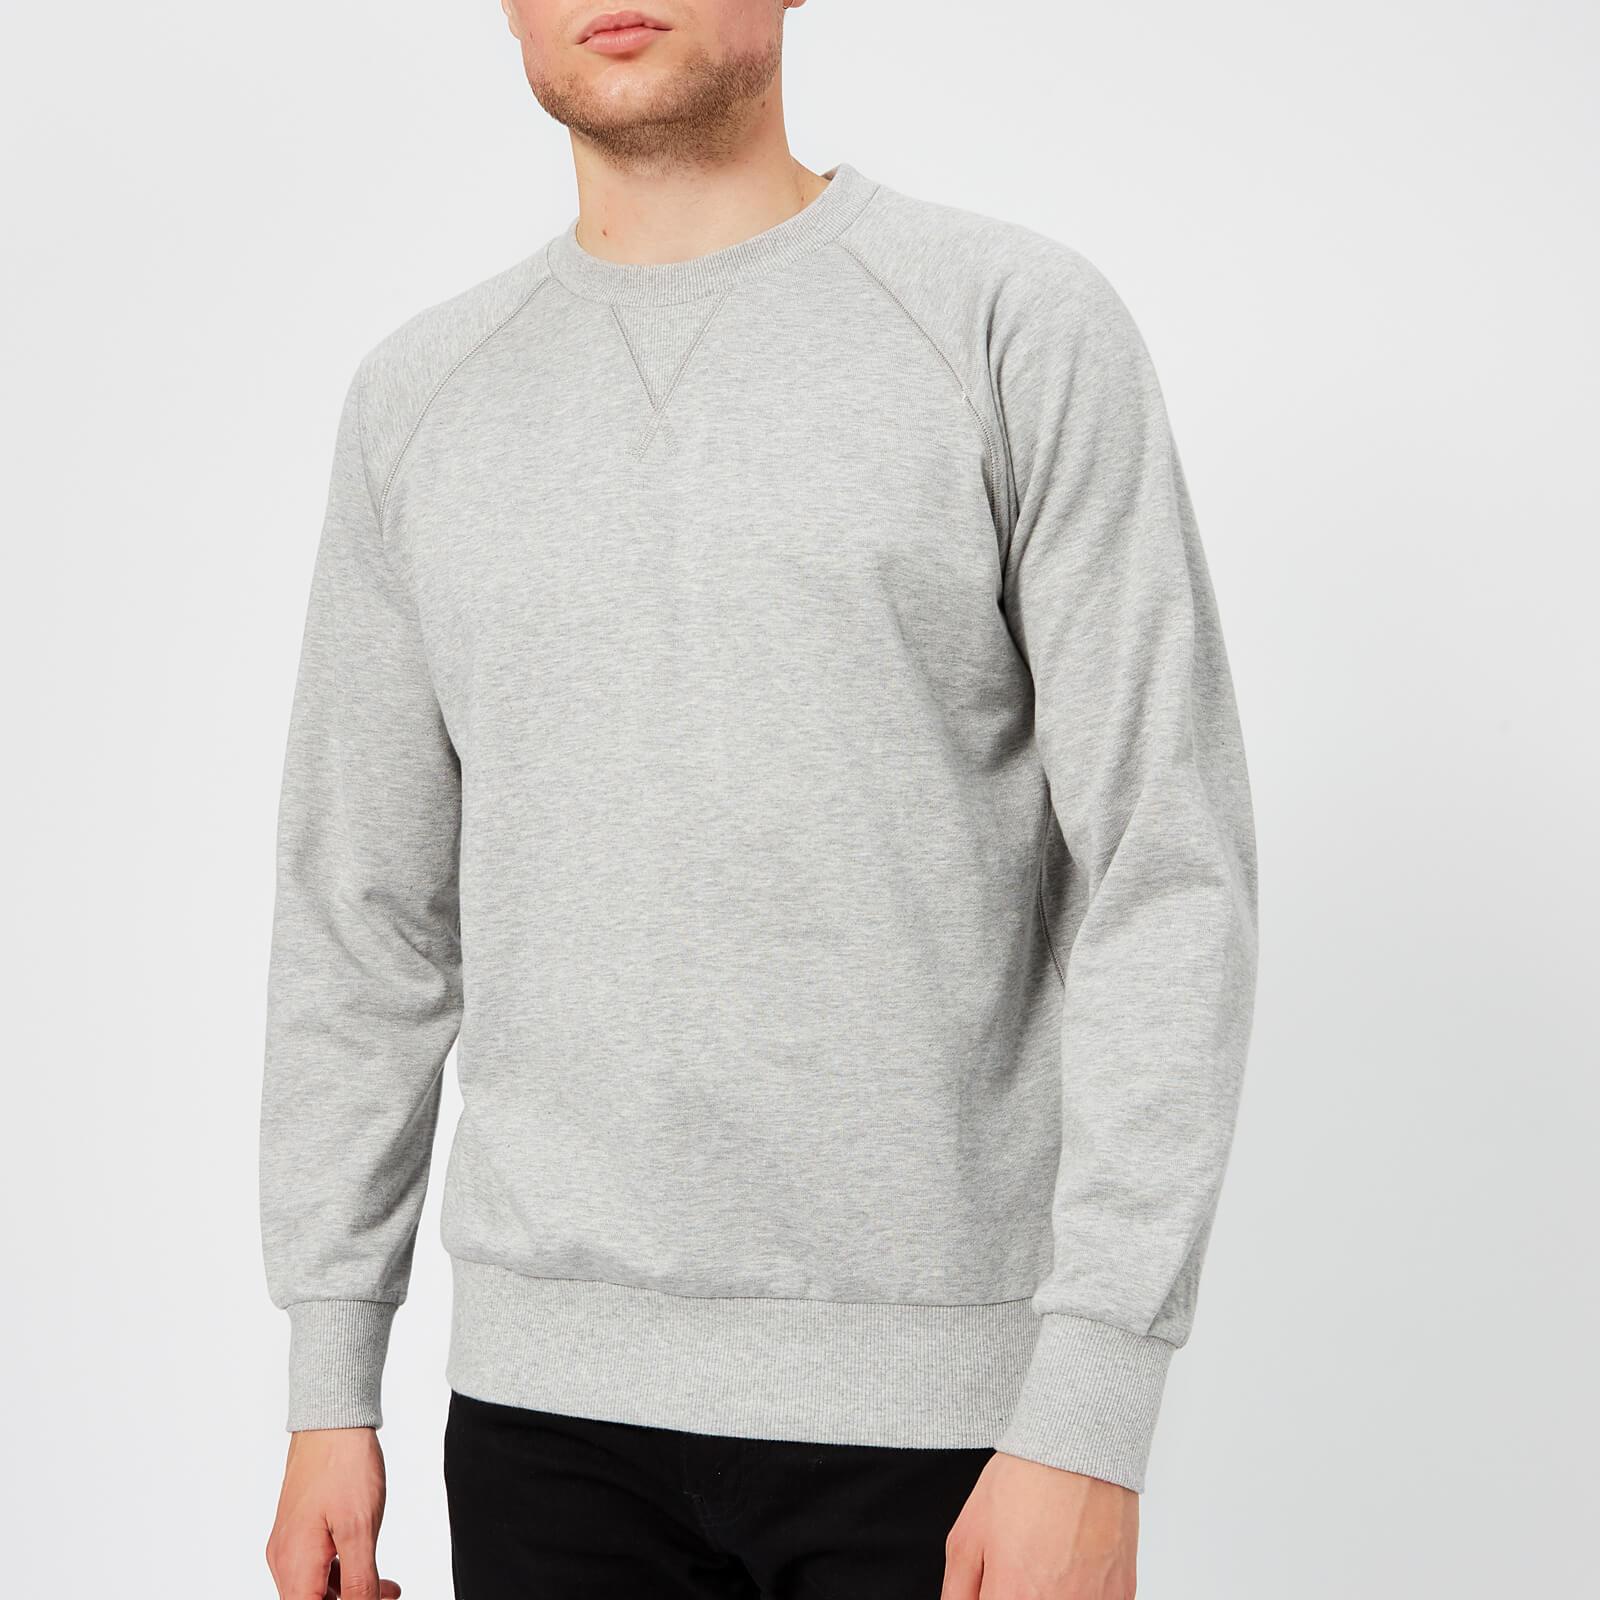 Adidas Y 3 Men Classic Sweater (gray medium grey heather)